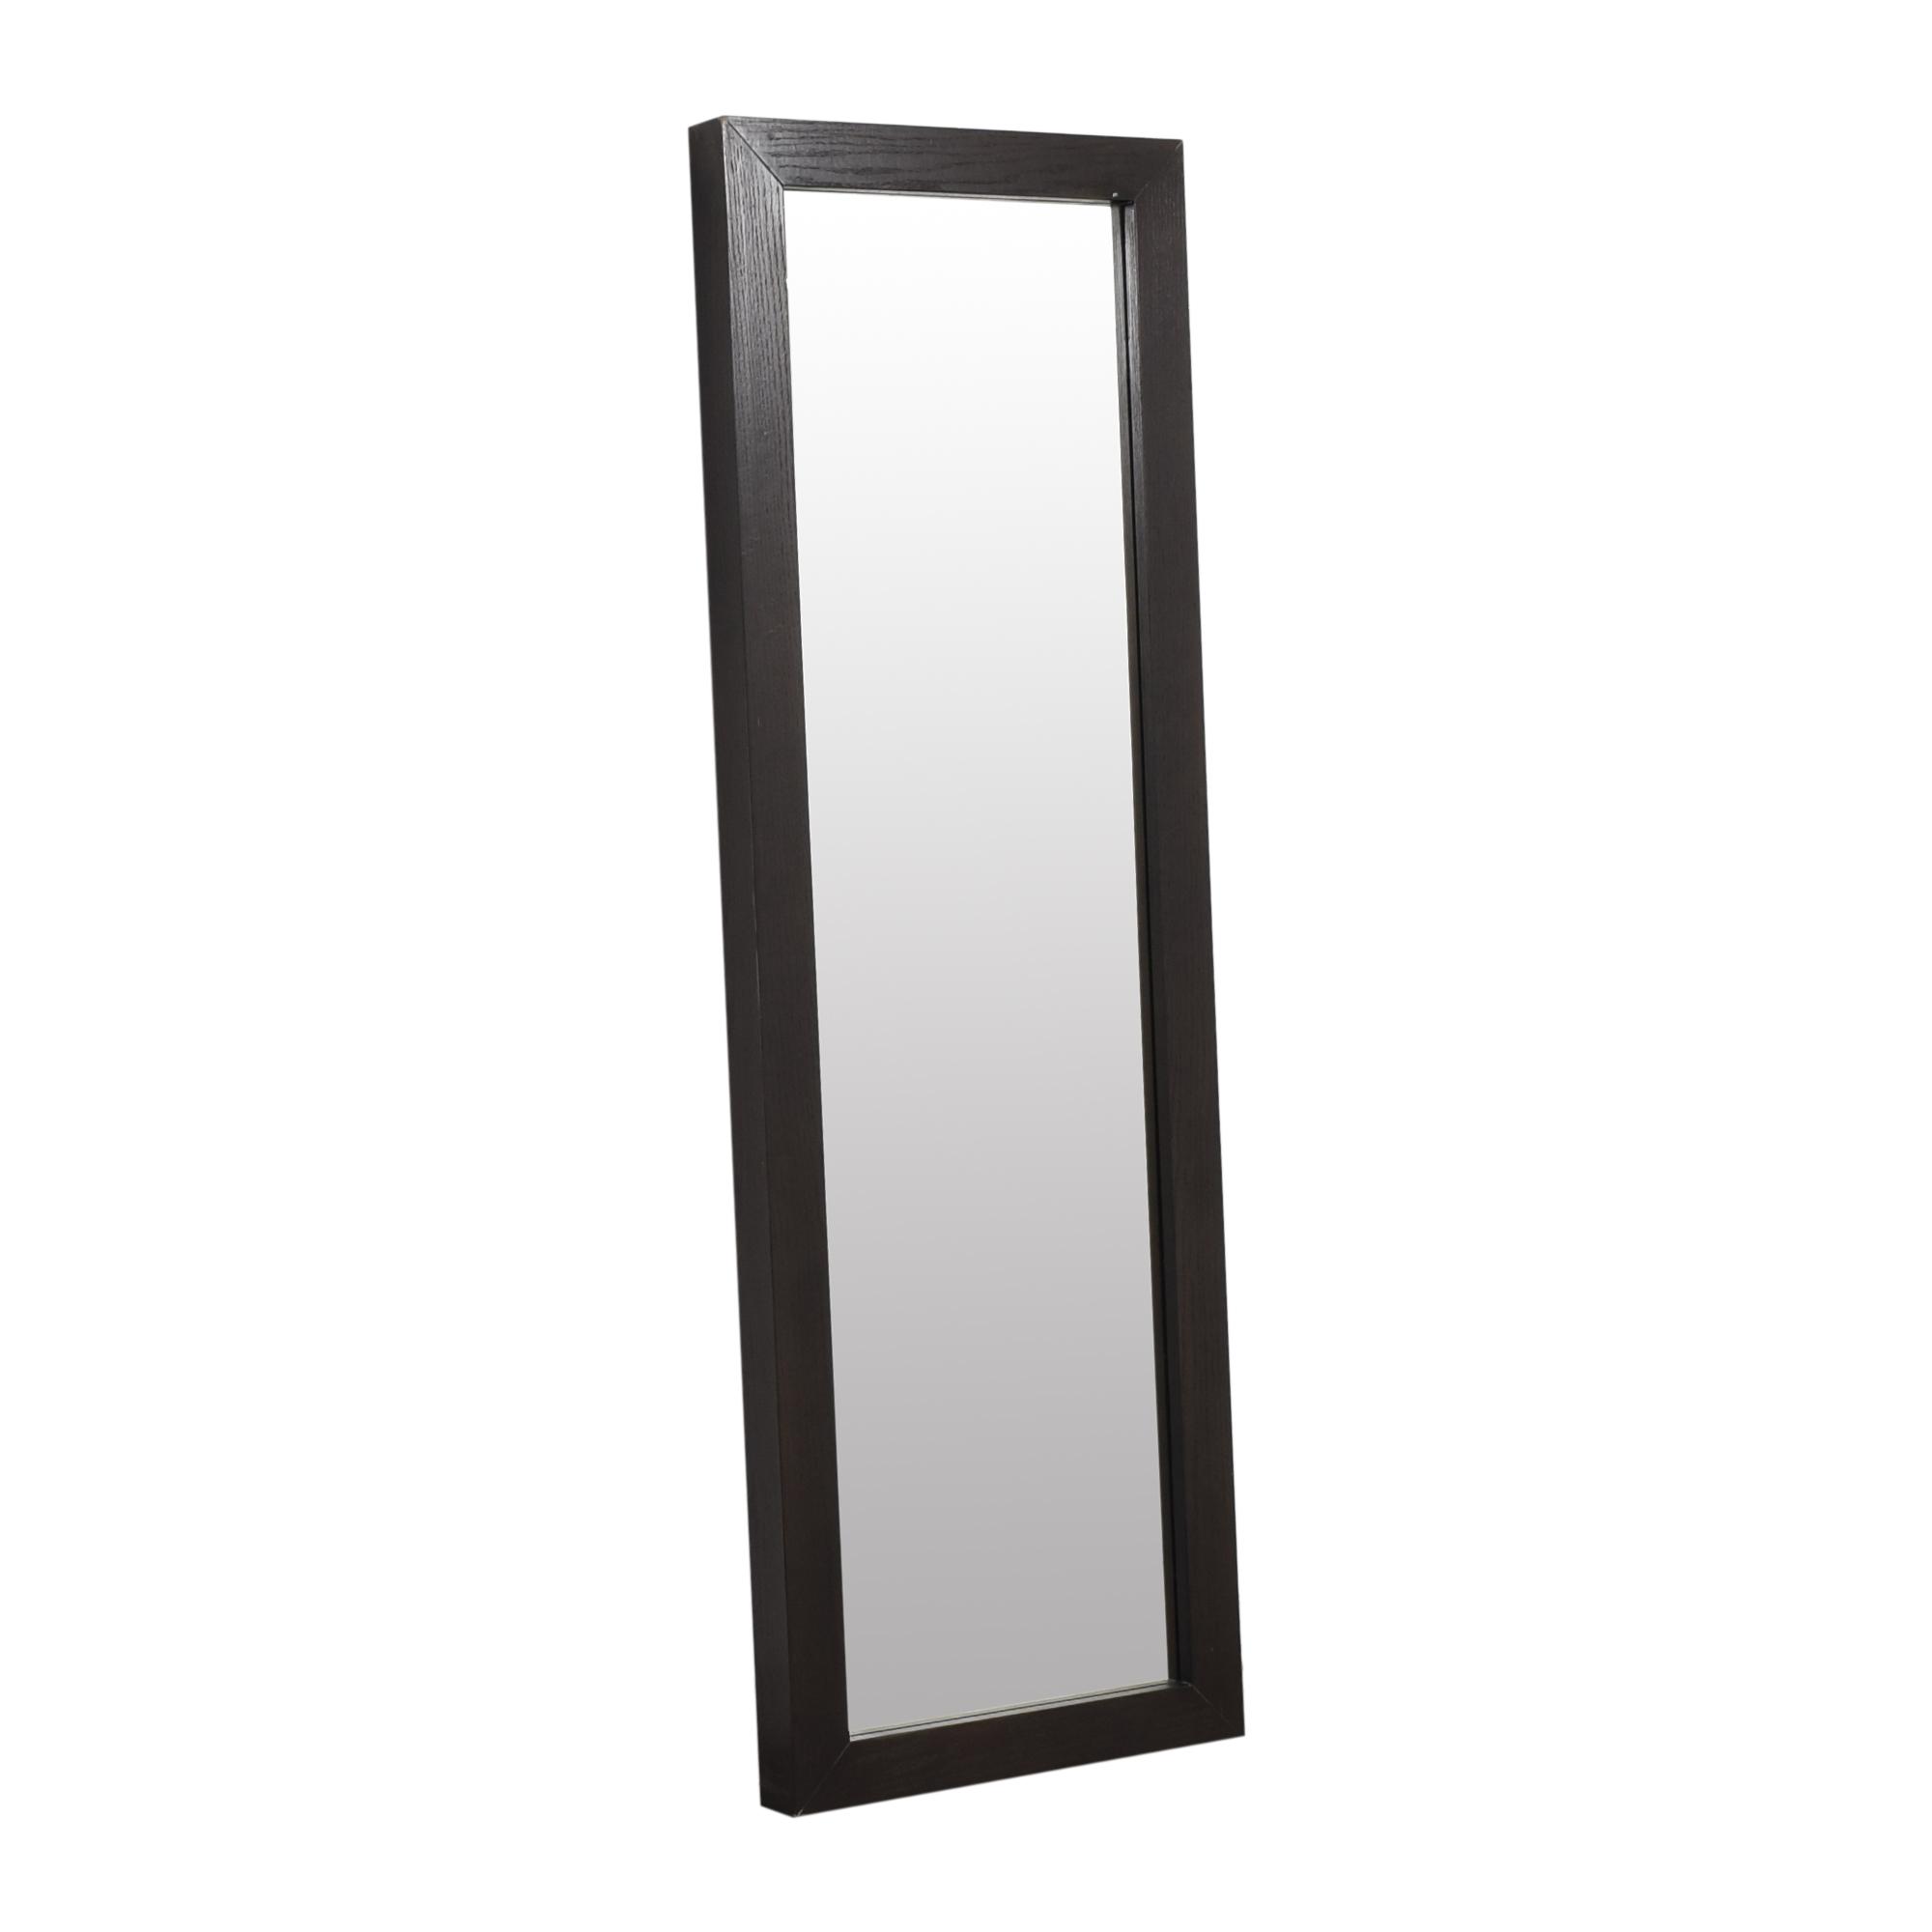 West Elm West Elm Parsons Floor Mirror ma